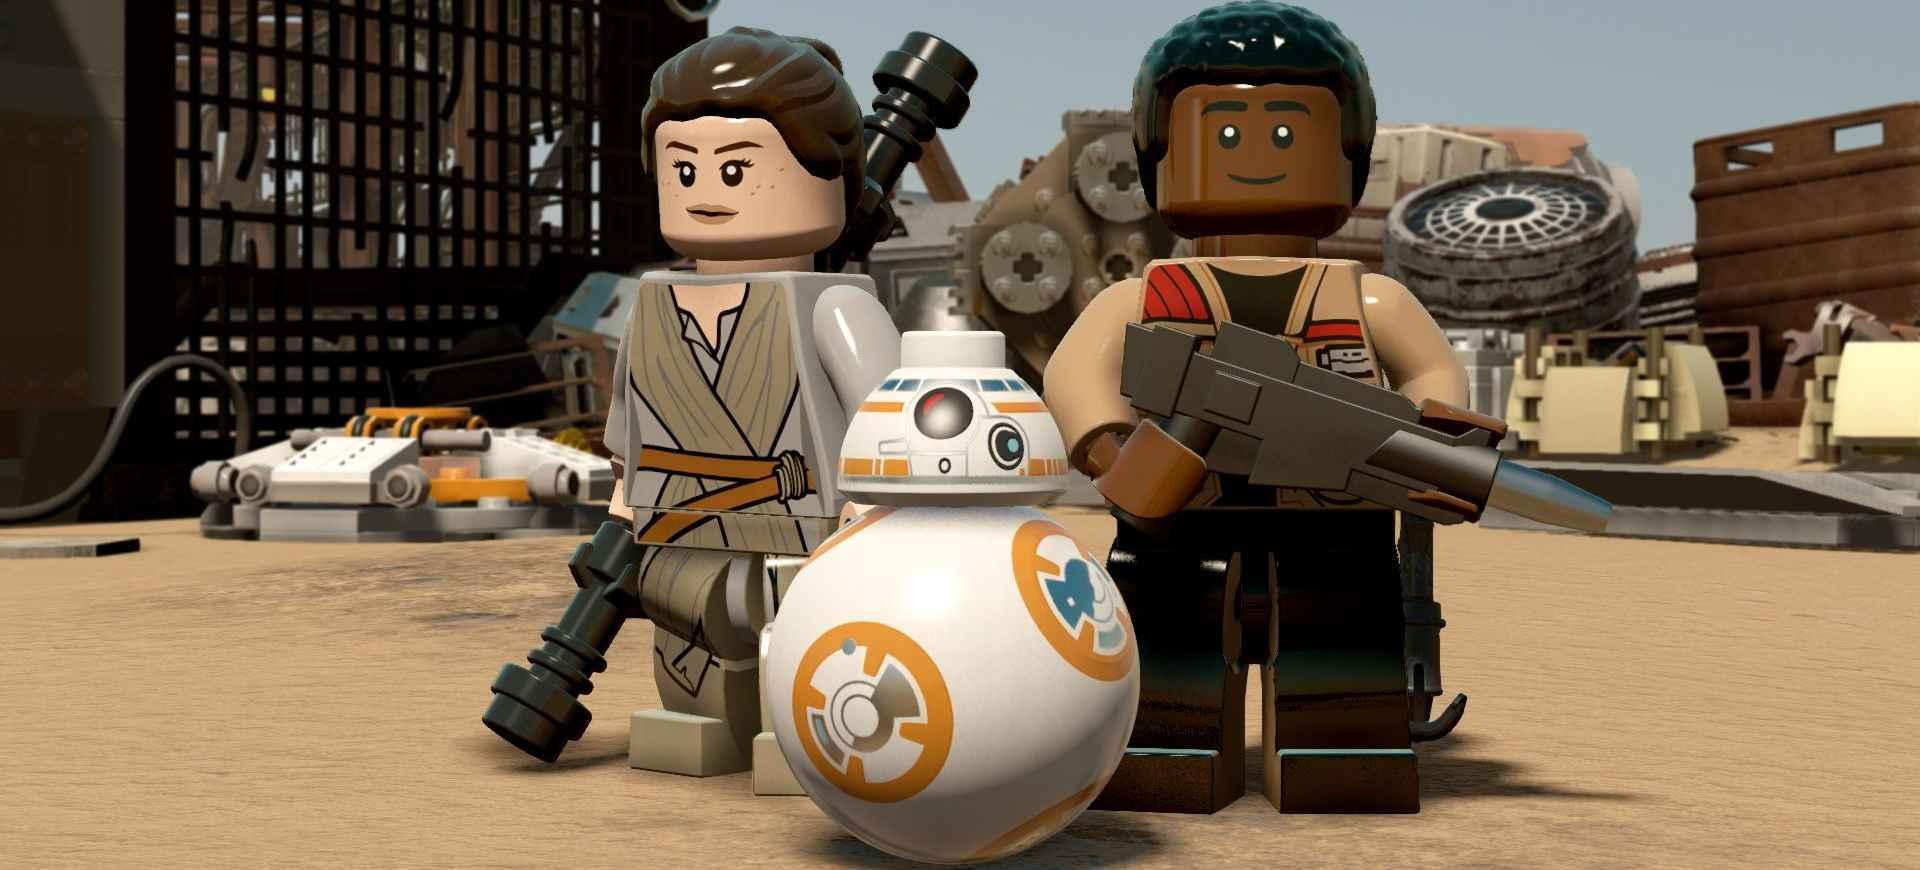 LEGO: Star Wars: The Force Awakens chuẩn bị đổ bộ Android - Tin Game Mobile